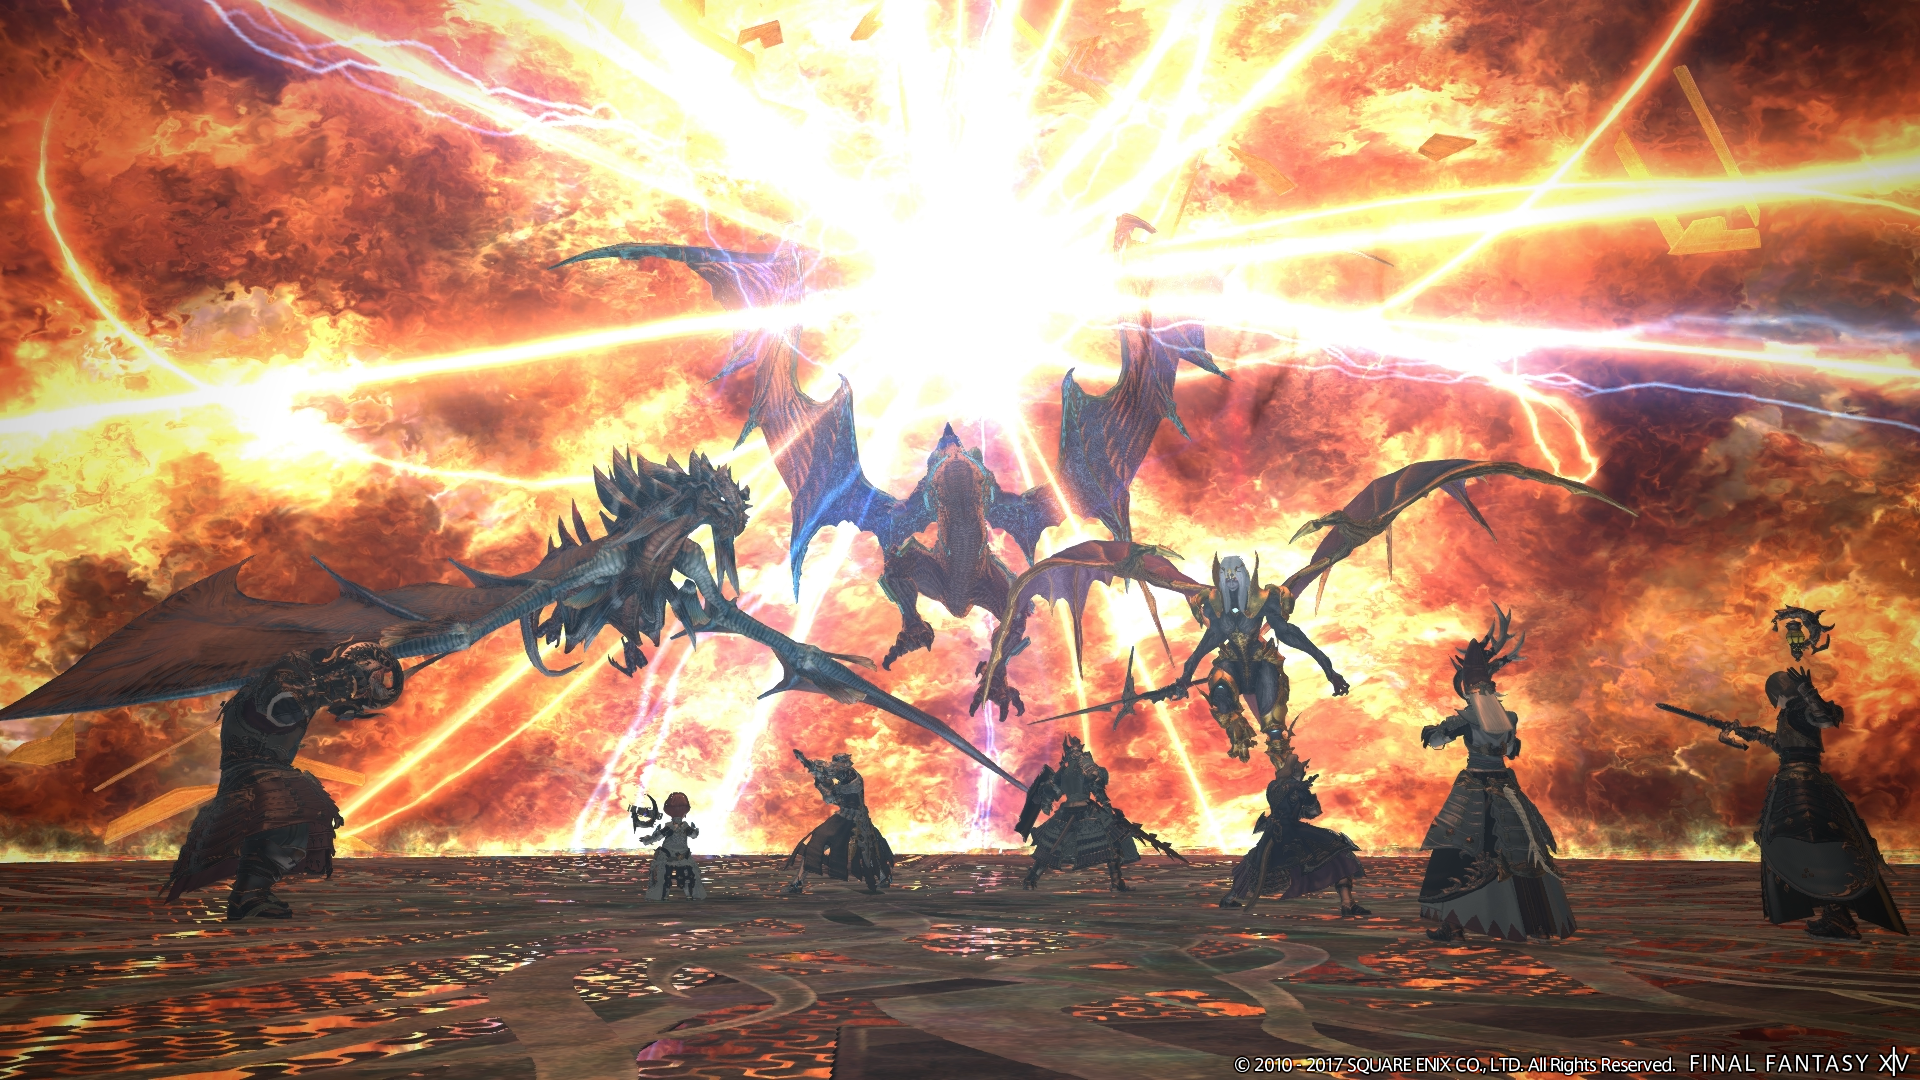 Final Fantasy XIV simplifies job gauges and veteran rewards